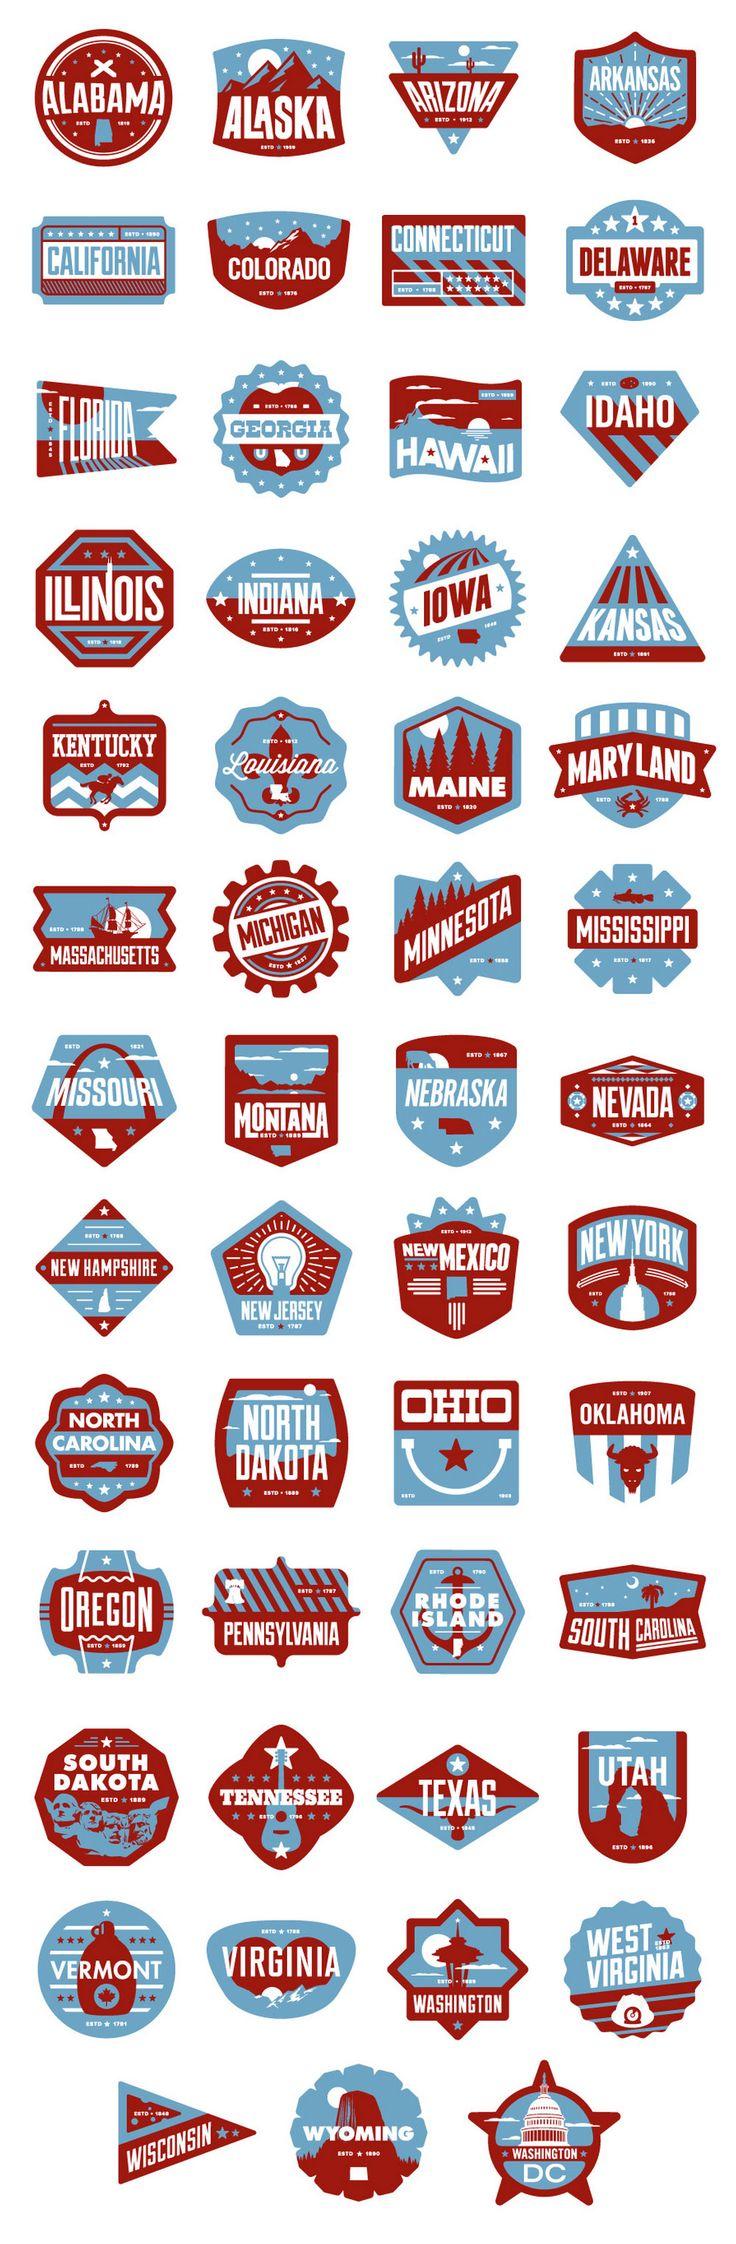 Floor Pass app badges designed by Chris Rushing